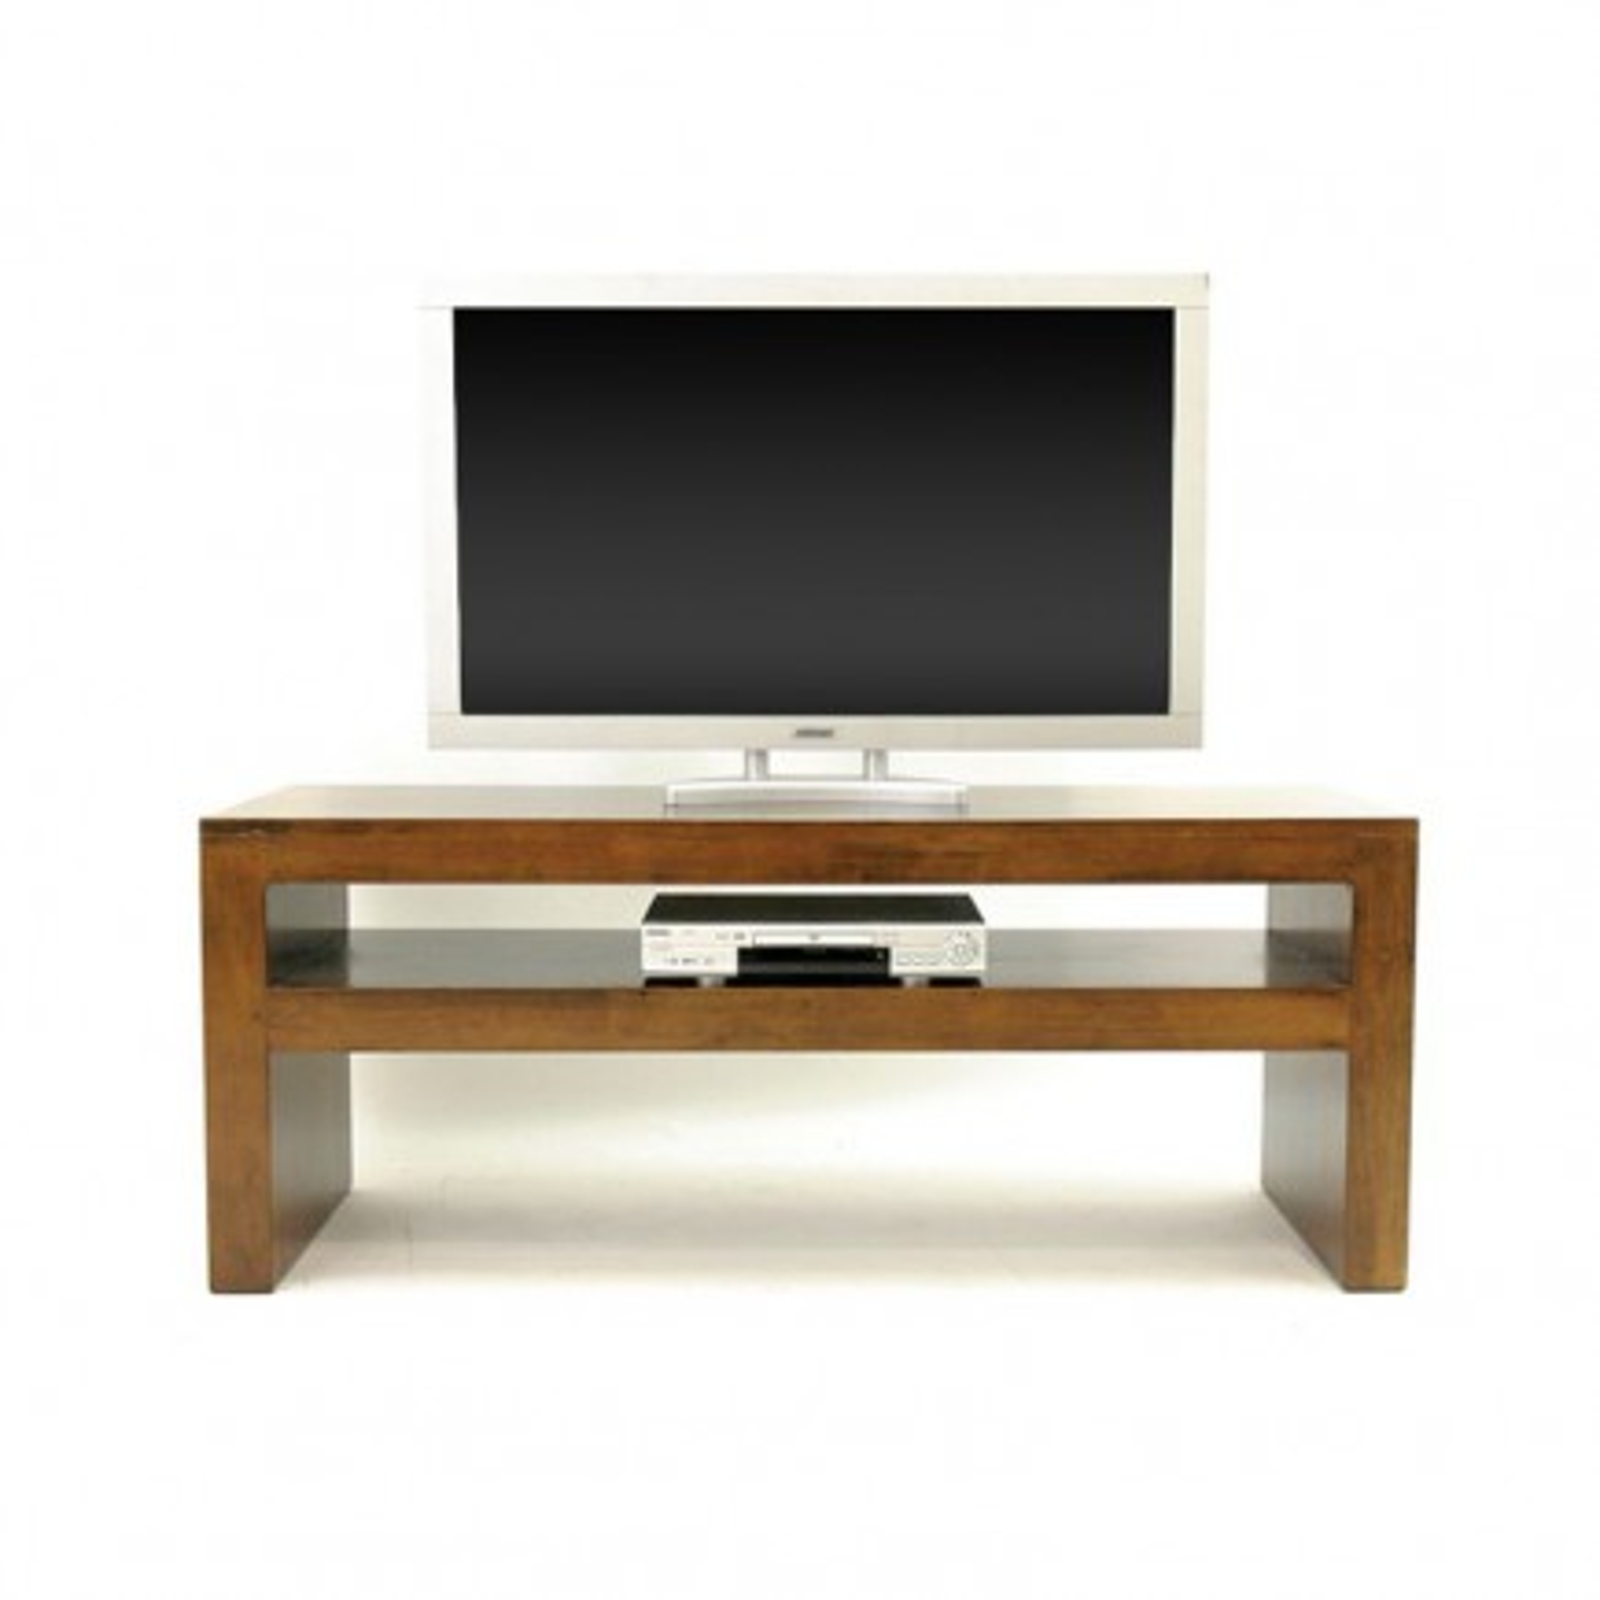 Meuble Tv Design Niche Omega Hévéa - meuble de salon en bois exotique